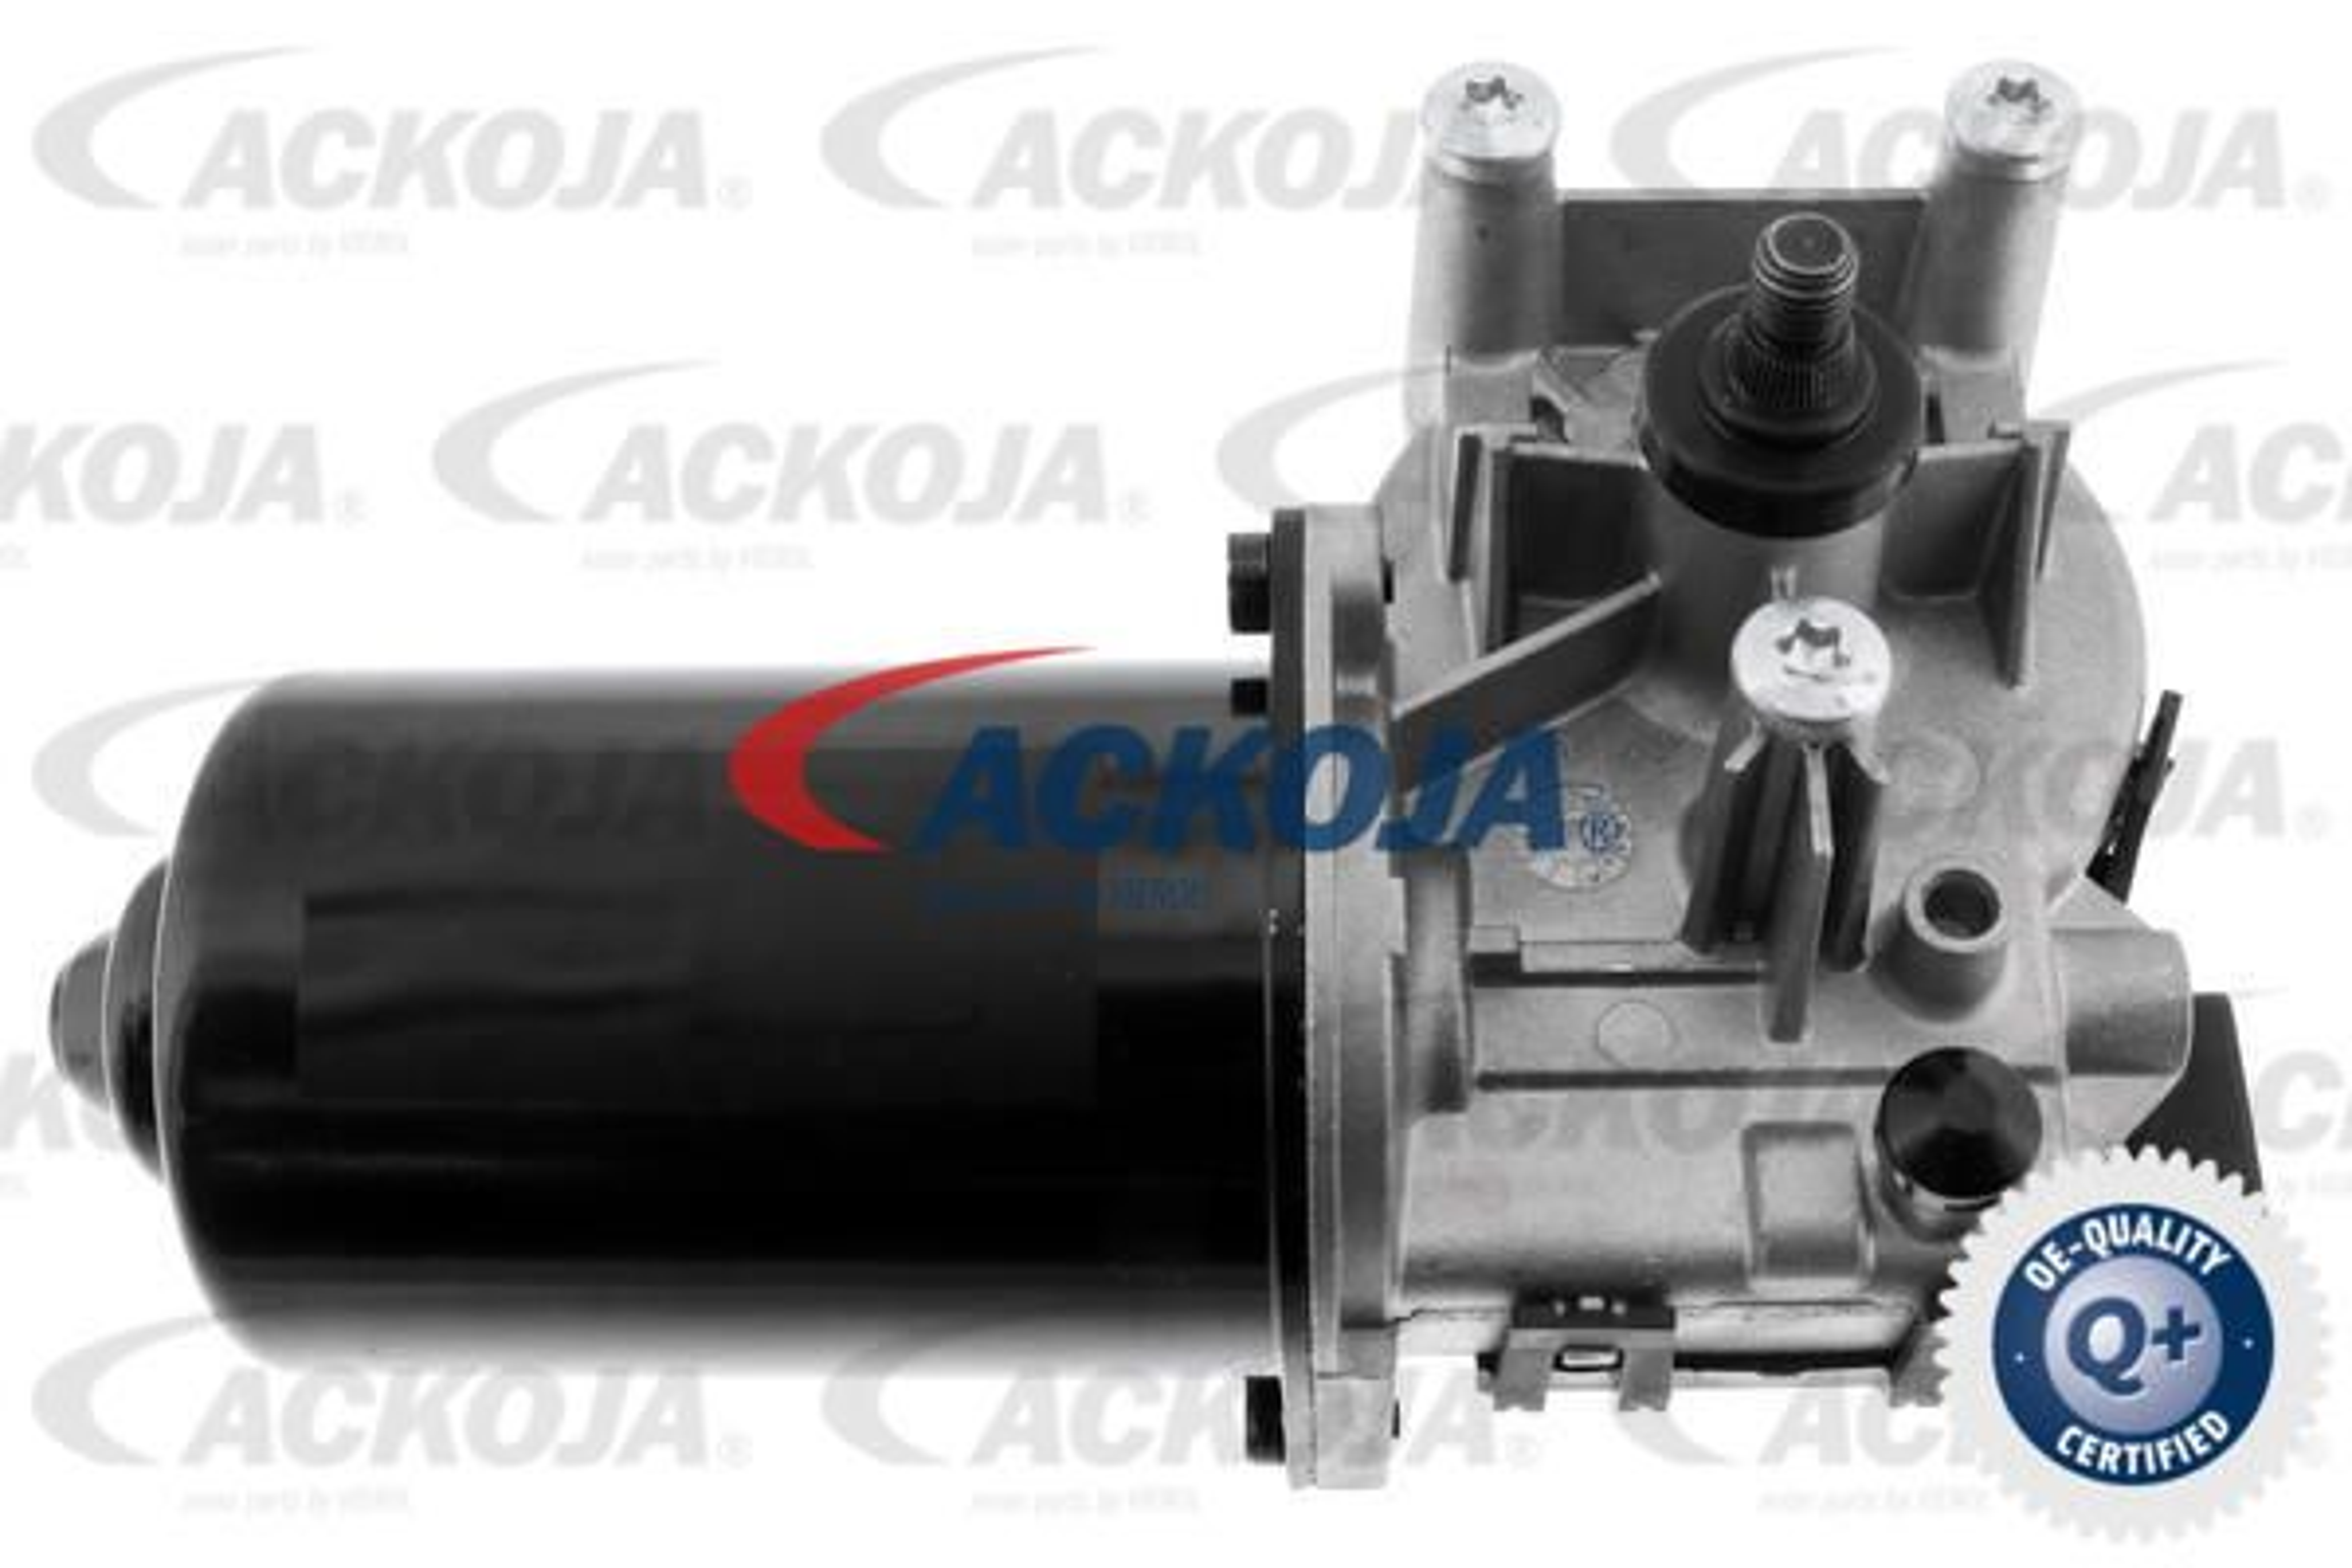 Windshield Wiper Motor A53-07-0101 ACKOJA A53-07-0101 original quality